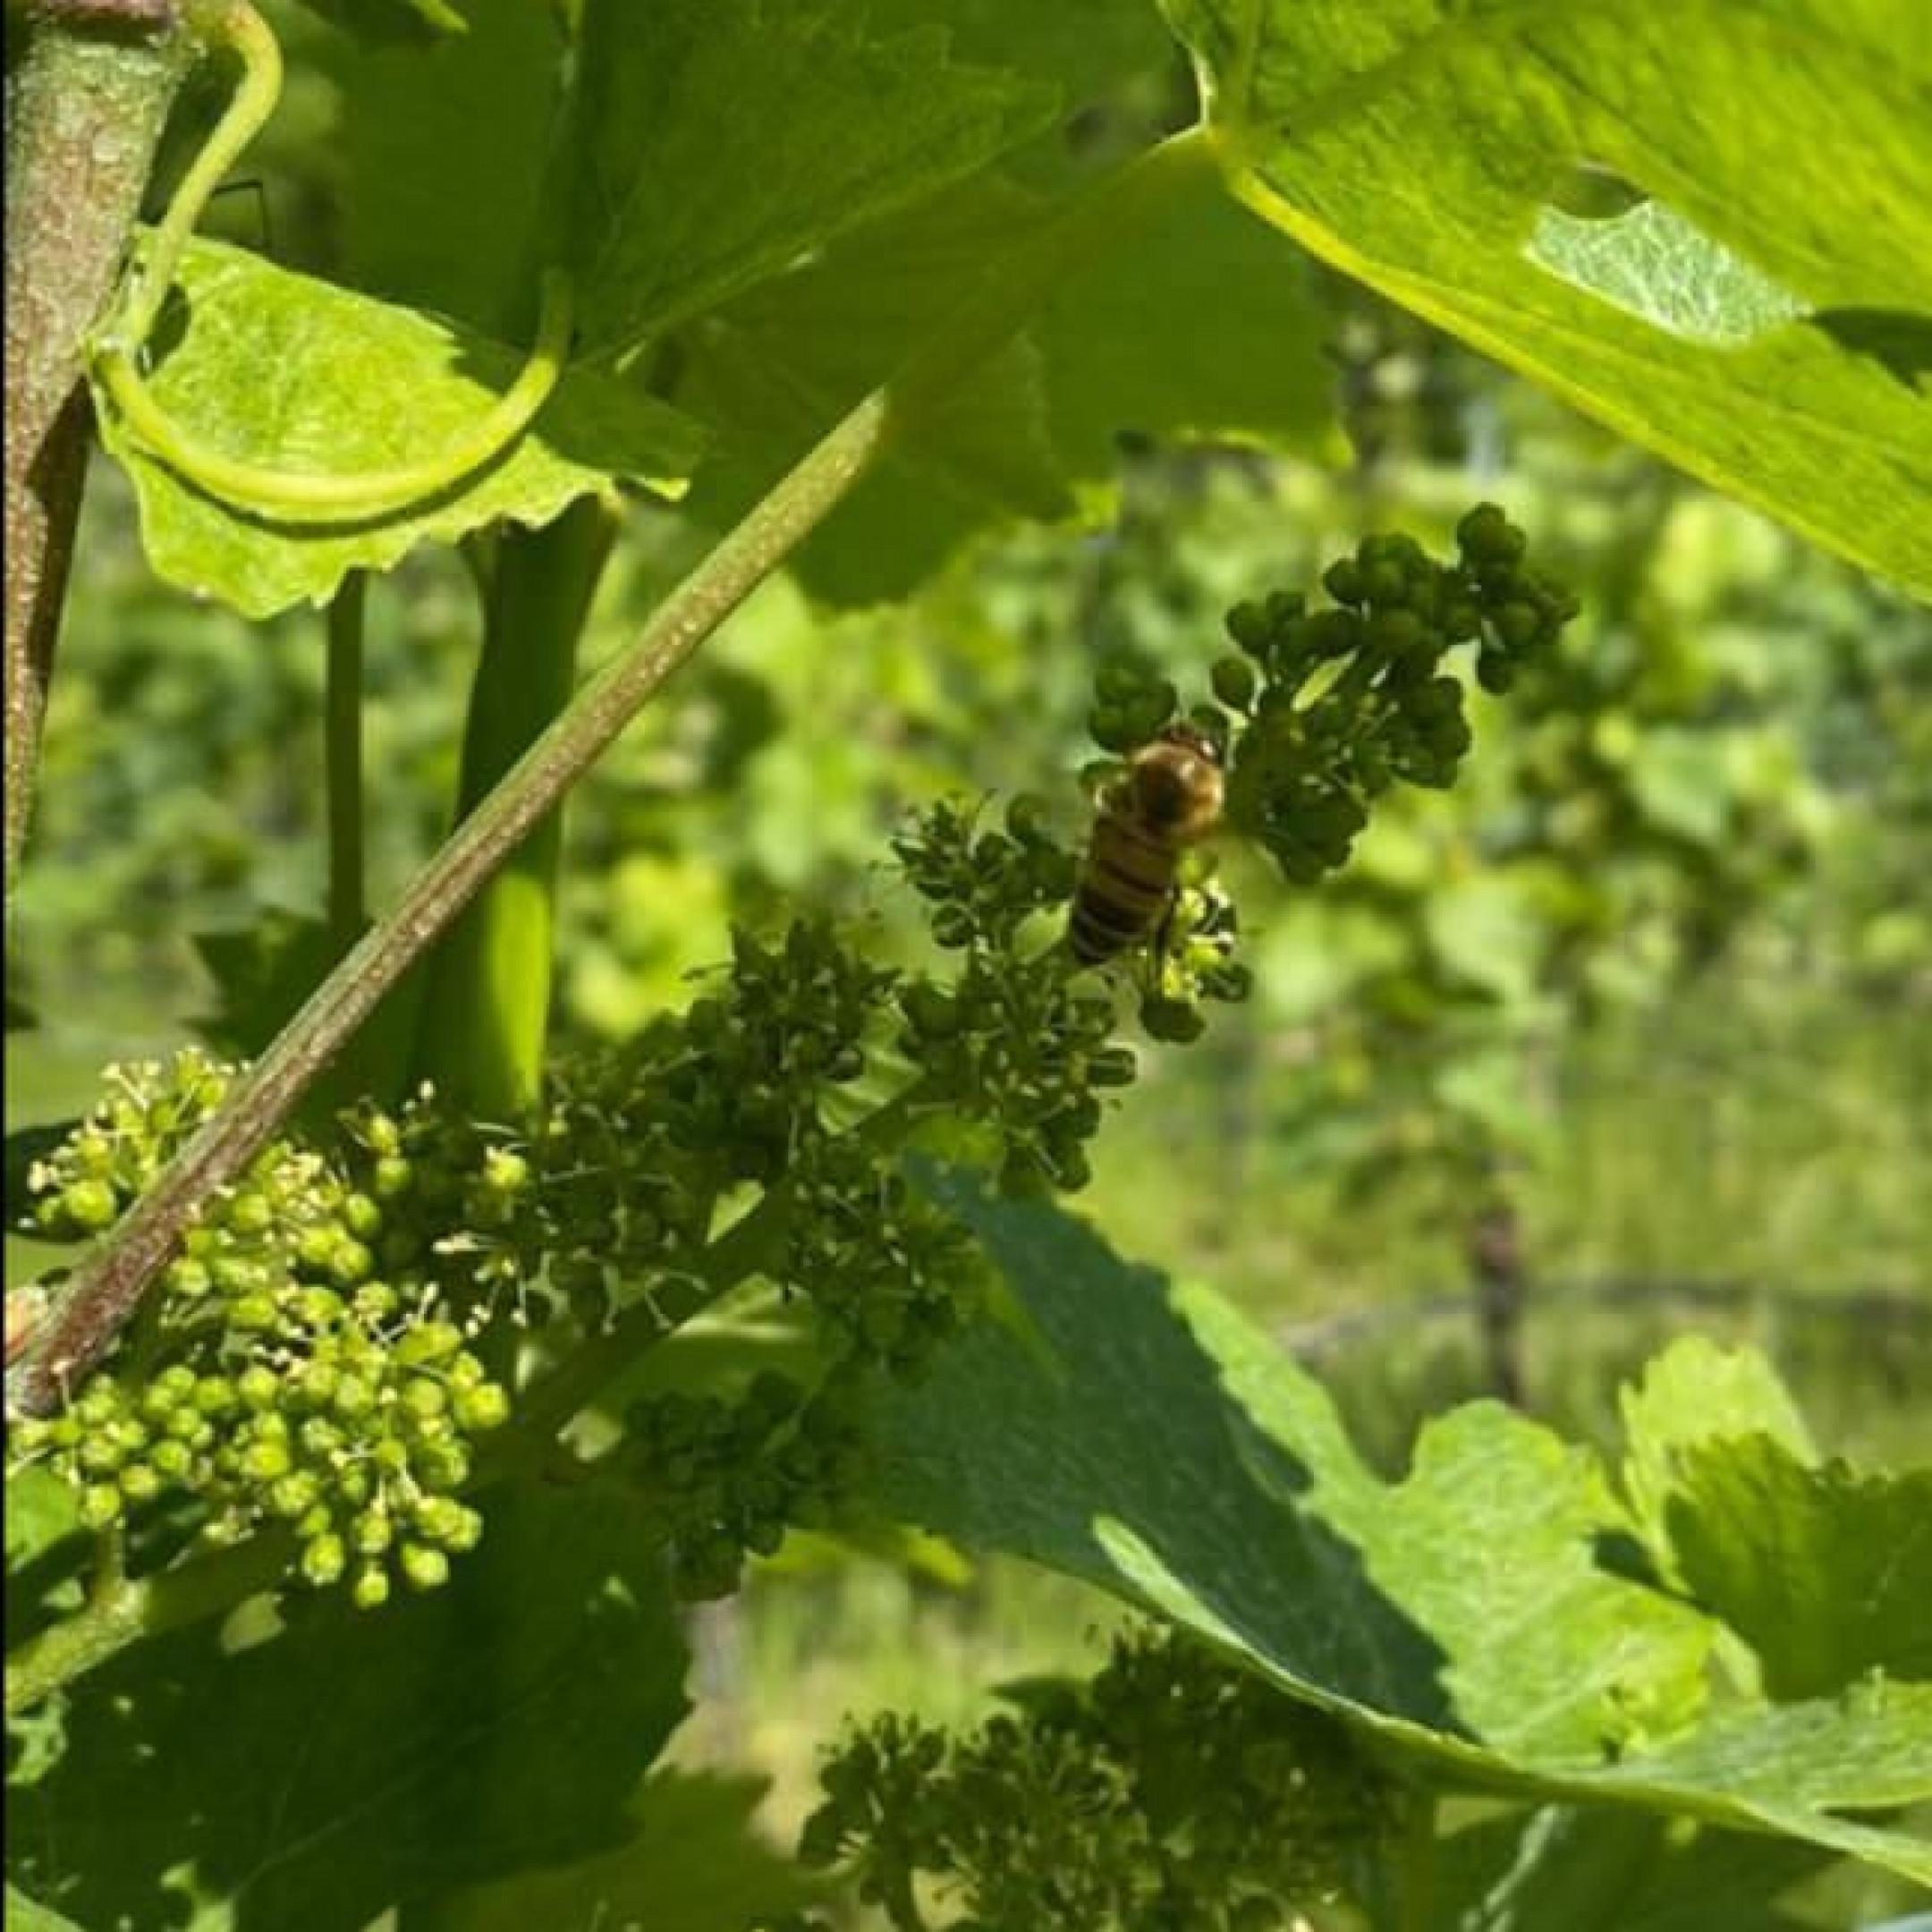 Nicola, il vino e la vigna #2